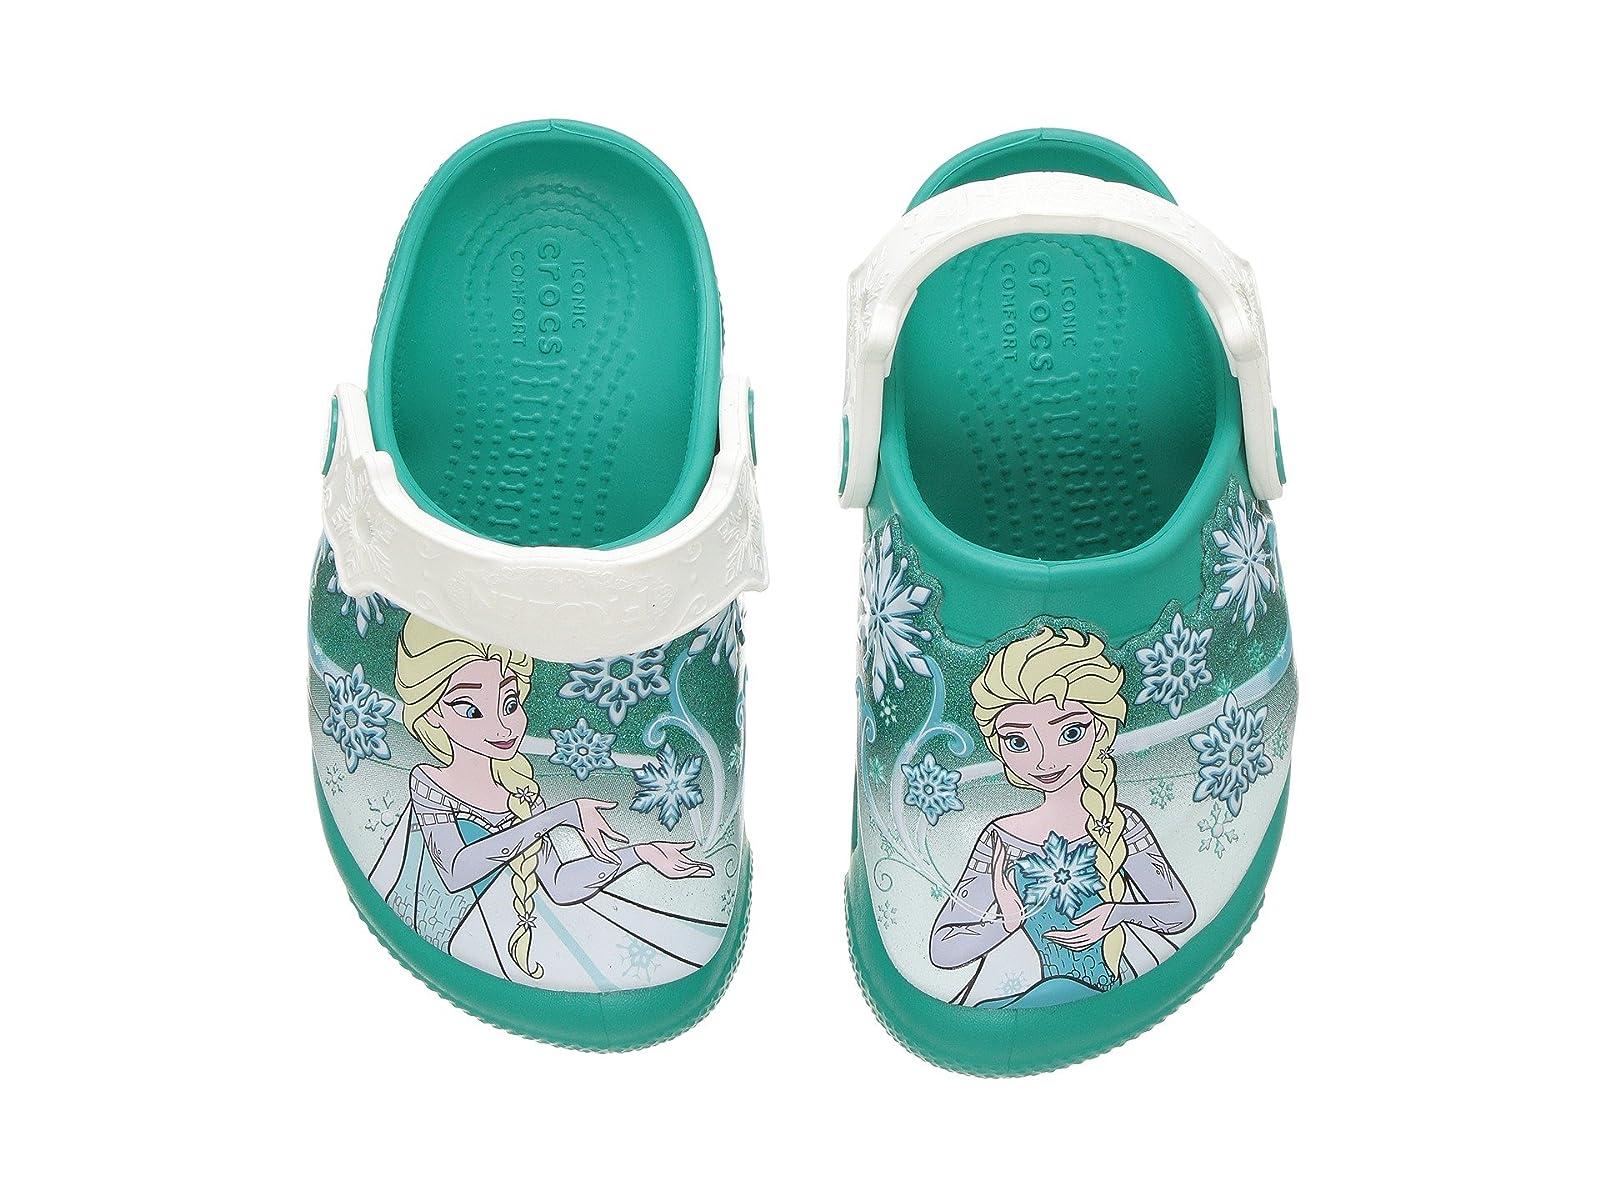 Crocs Kids Frozen™ Lights Clog (Toddler/Little Kid)Economical and quality shoes